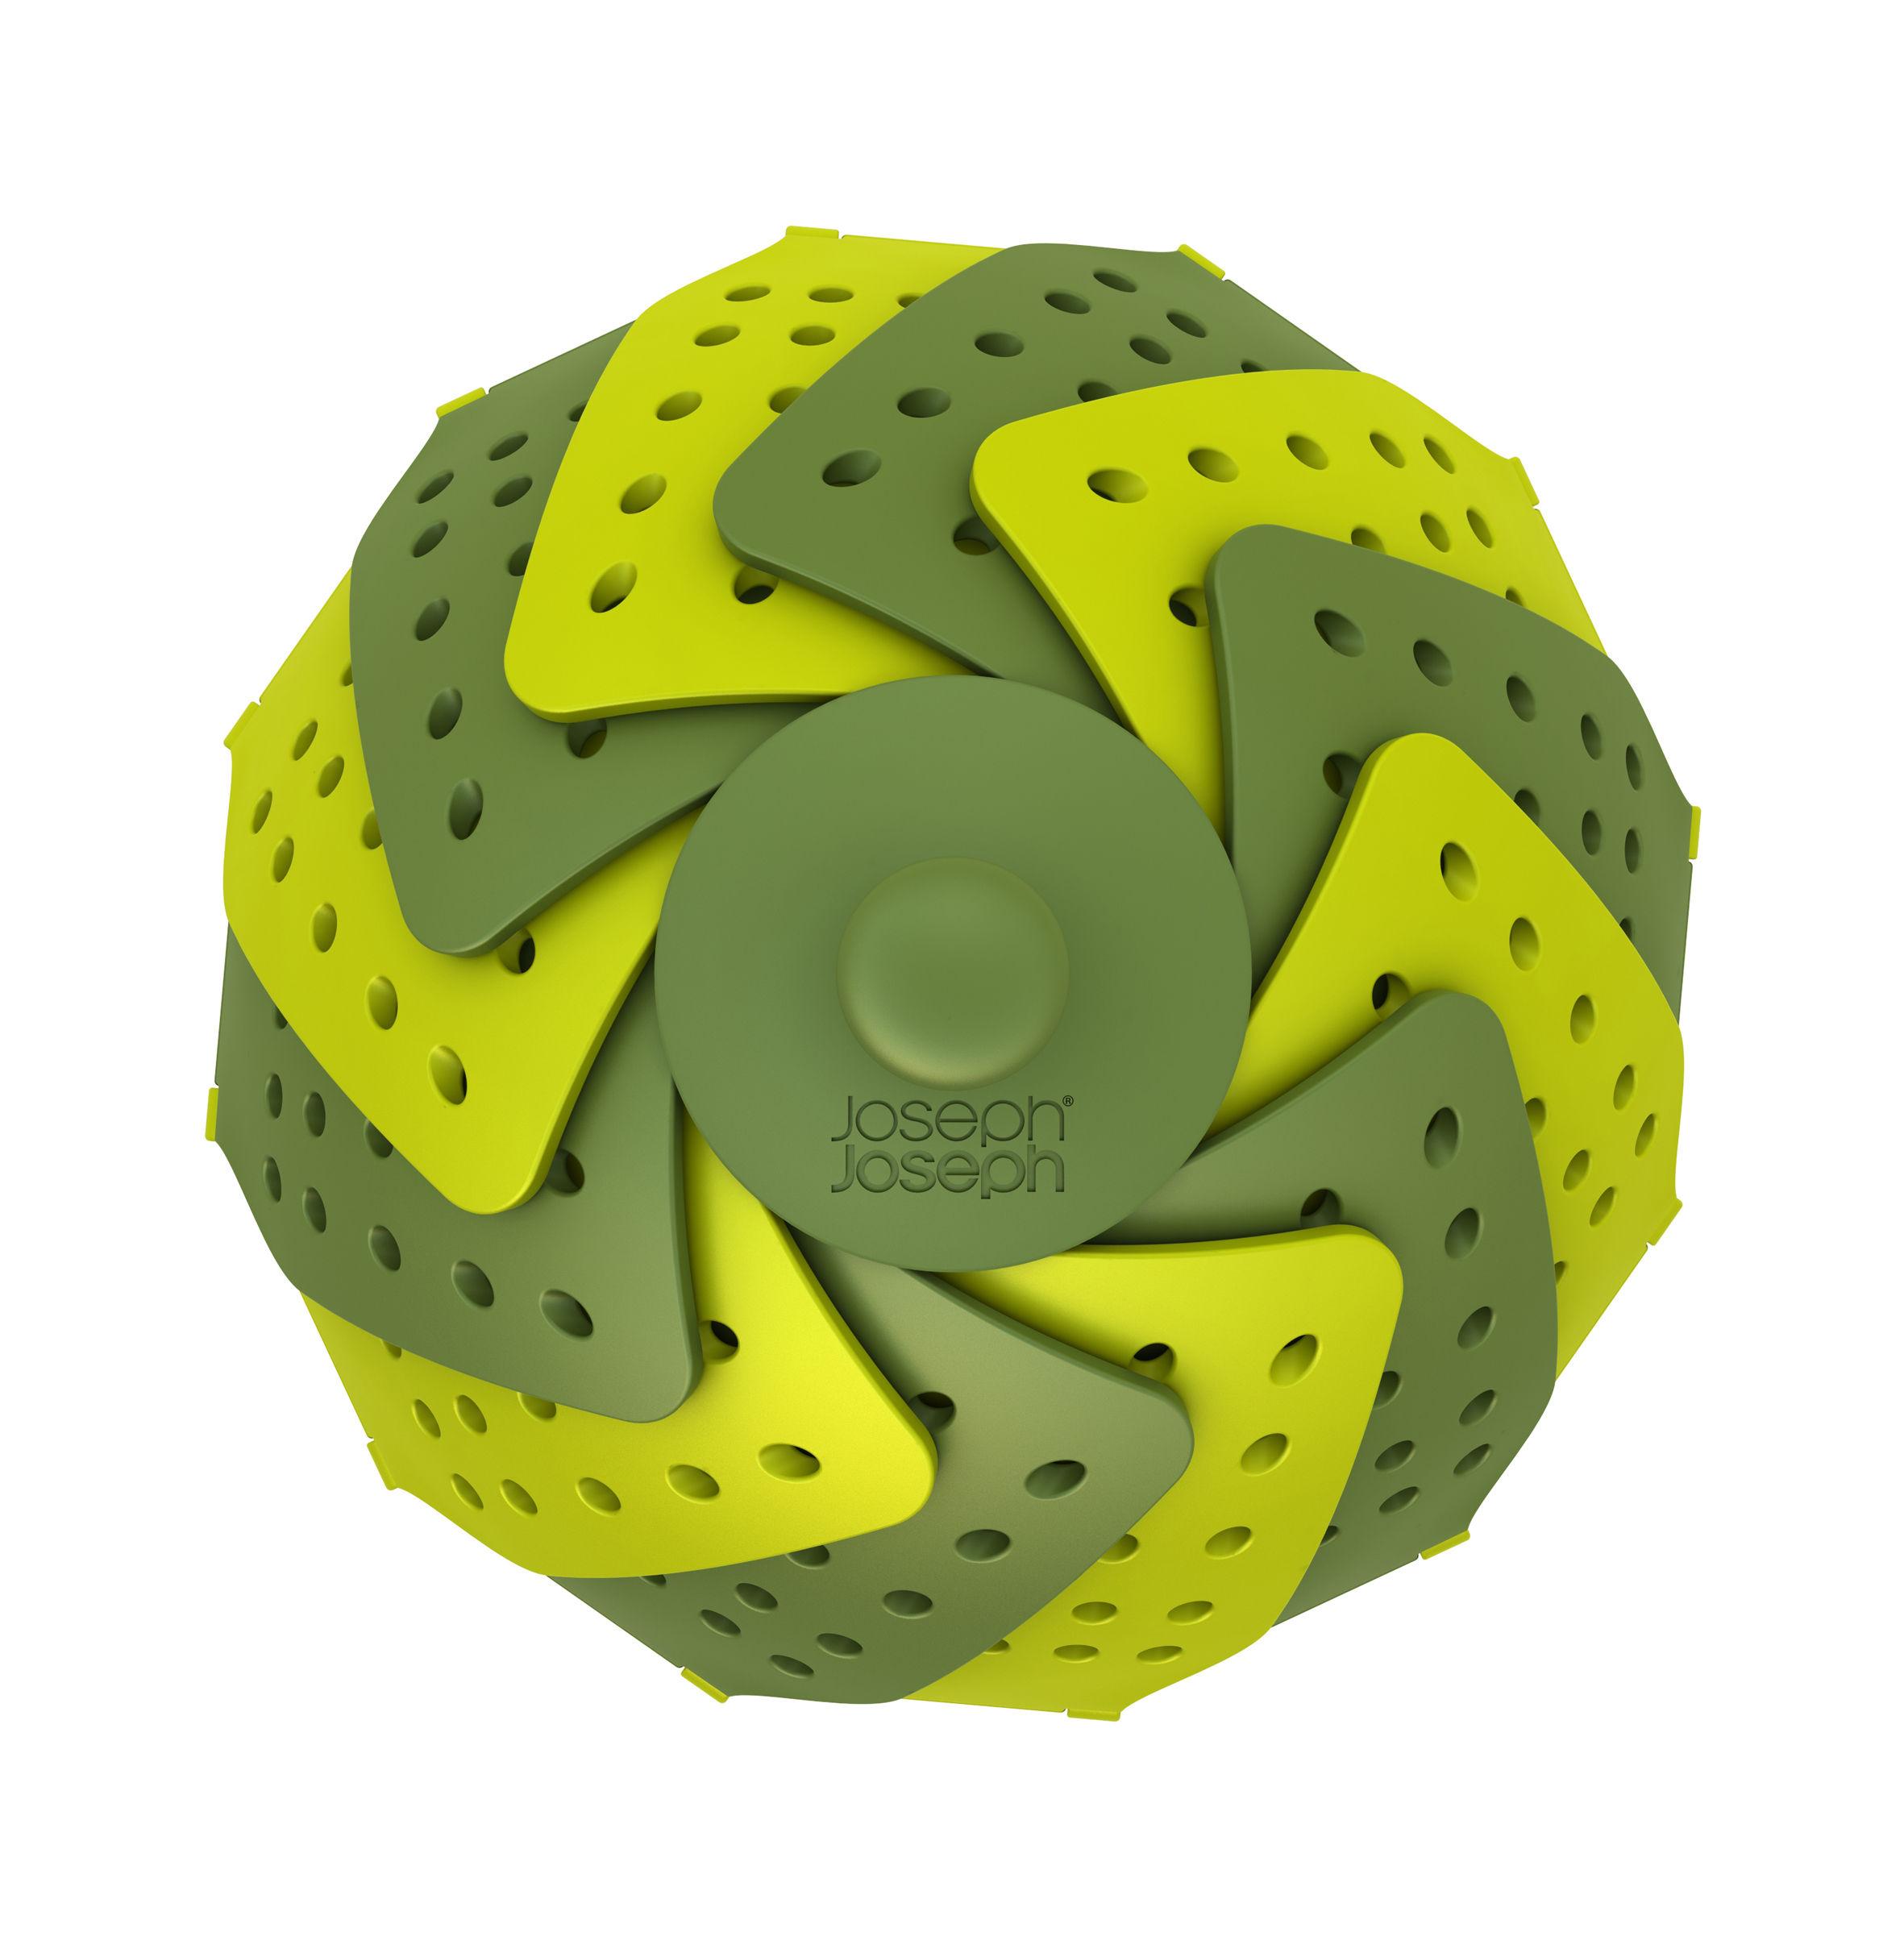 Panier vapeur lotus vert vert clair joseph joseph - Vaporera profesional ...